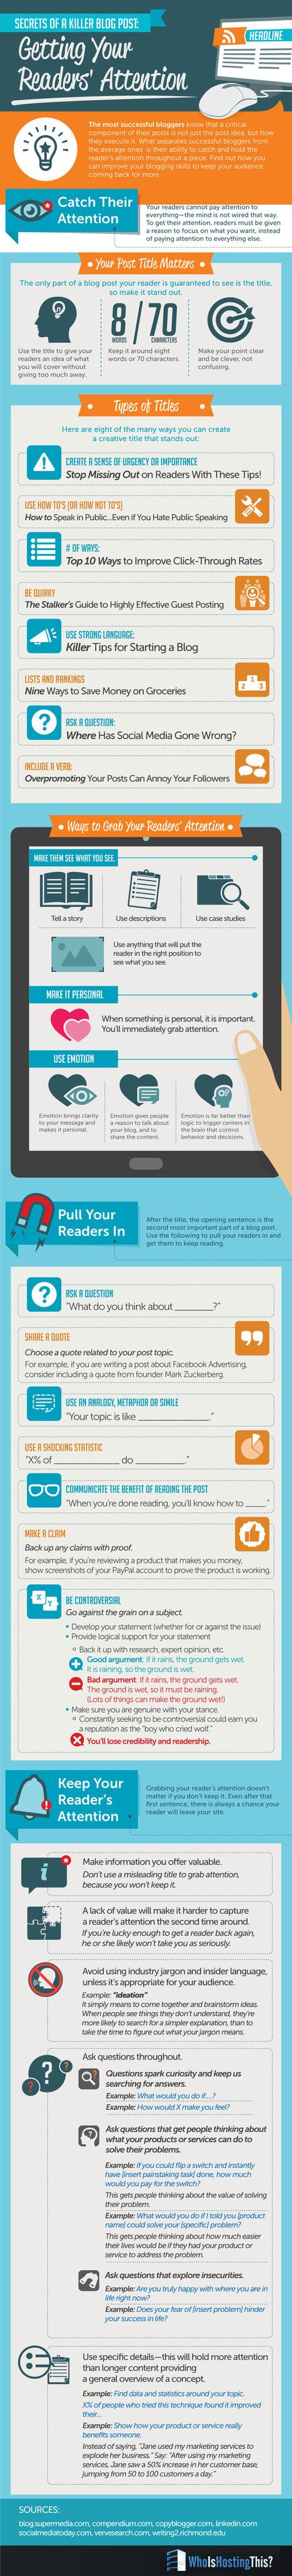 Here is How You Write a Killer Blog Post   Digital Marketing Ramblings   Scoop.it